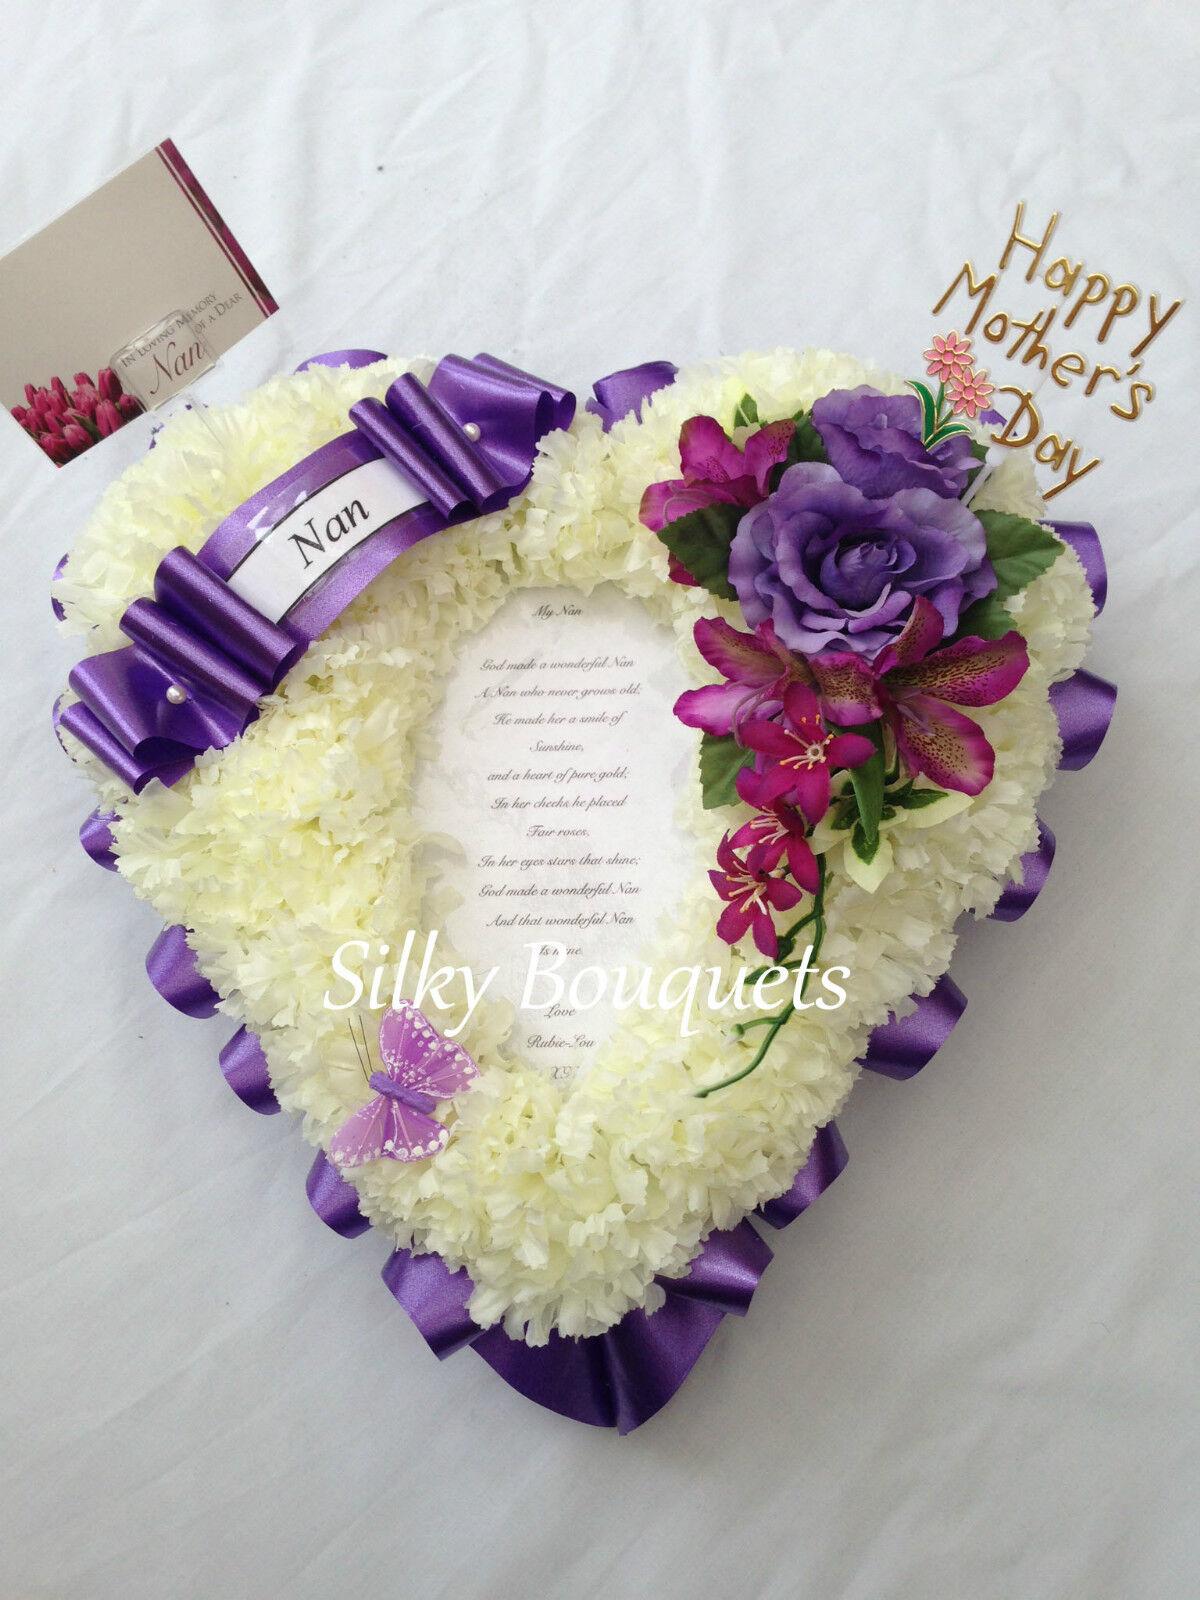 Details about Artificial Silk Funeral Flower Poem Heart Photo Tribute Mum  Nan Memorial Faux